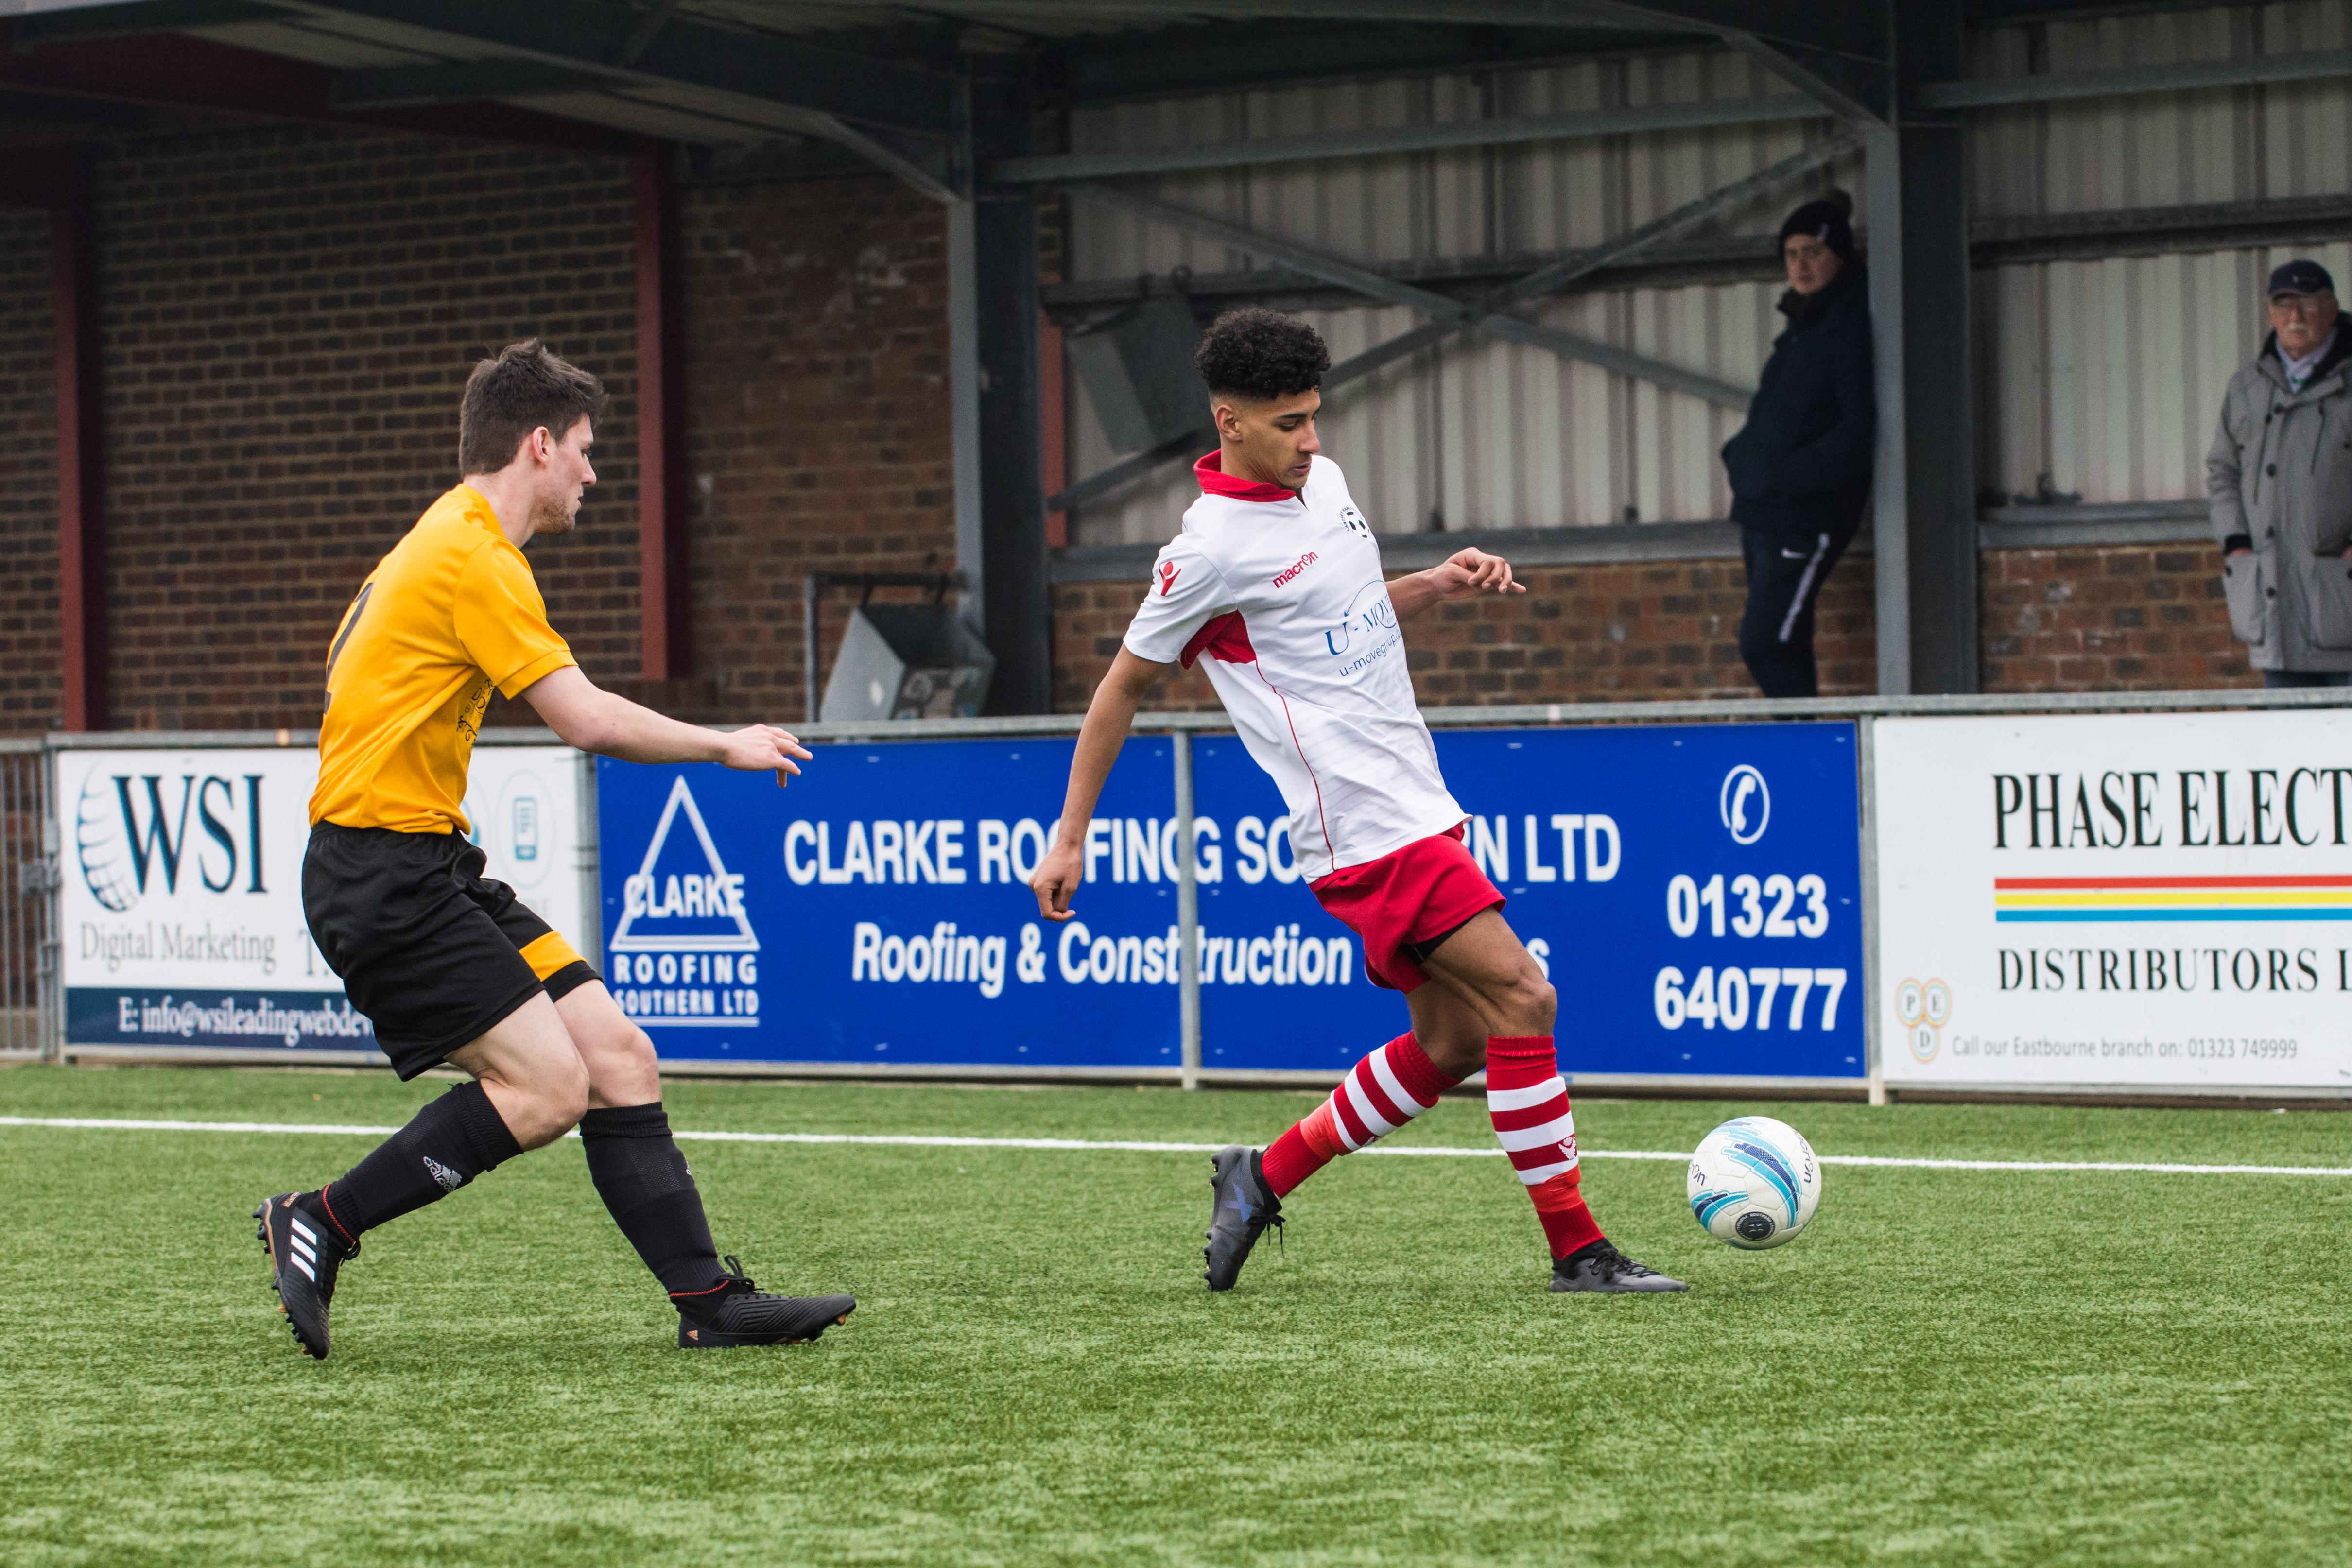 DAVID_JEFFERY Langney Wanderers FC vs Bexhill United FC 03.03.18 29